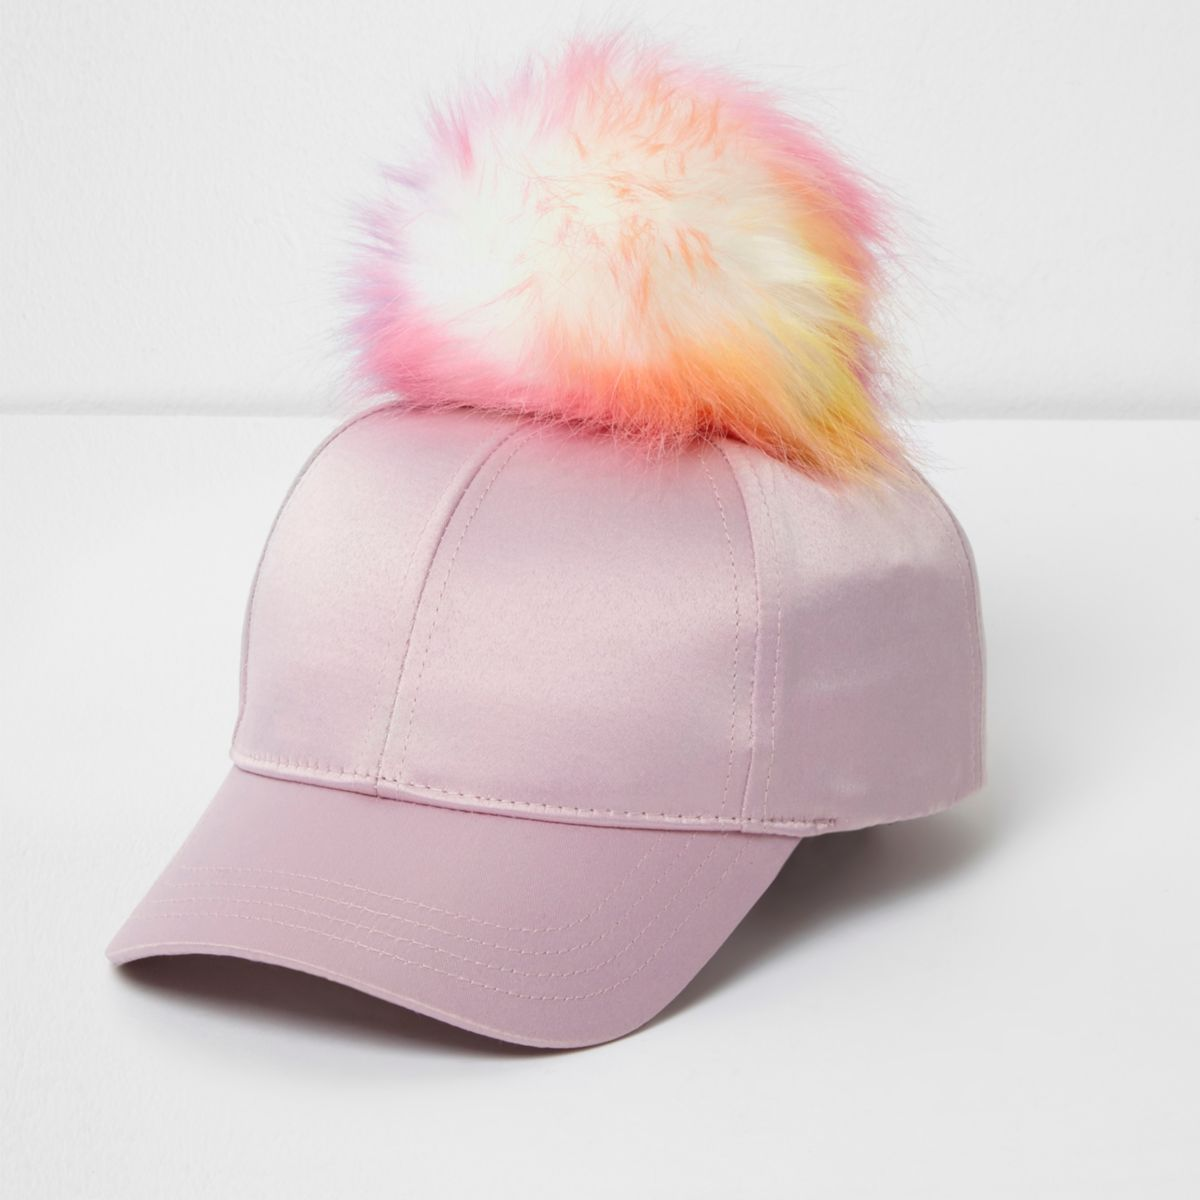 Girls pink satin pom pom baseball cap